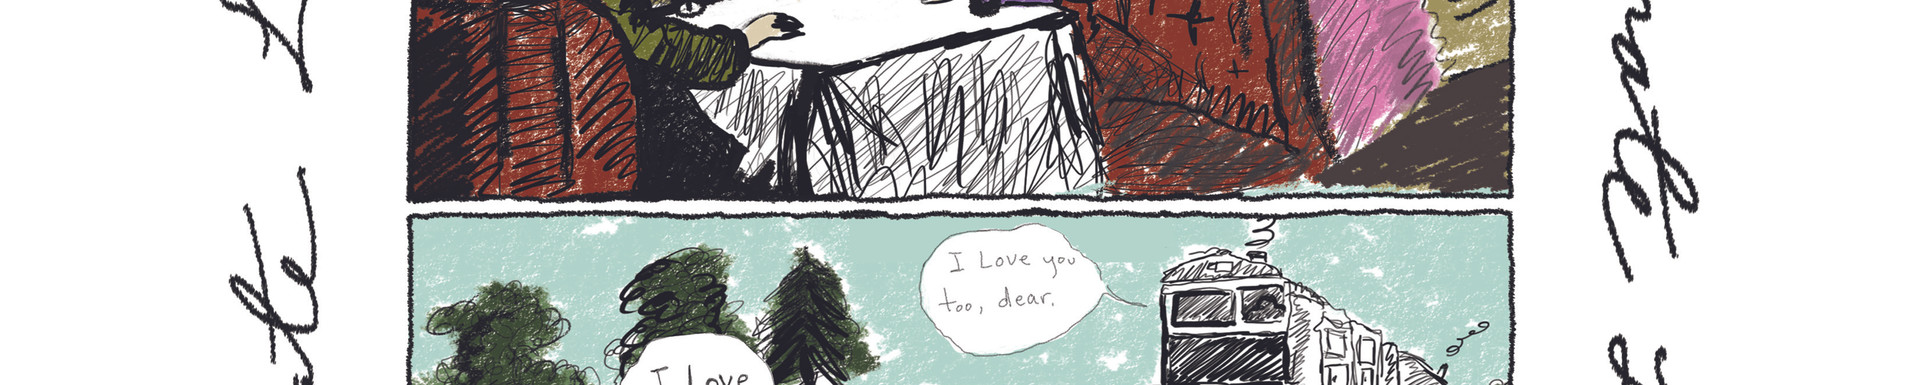 anna karenina for Long Story Short Book